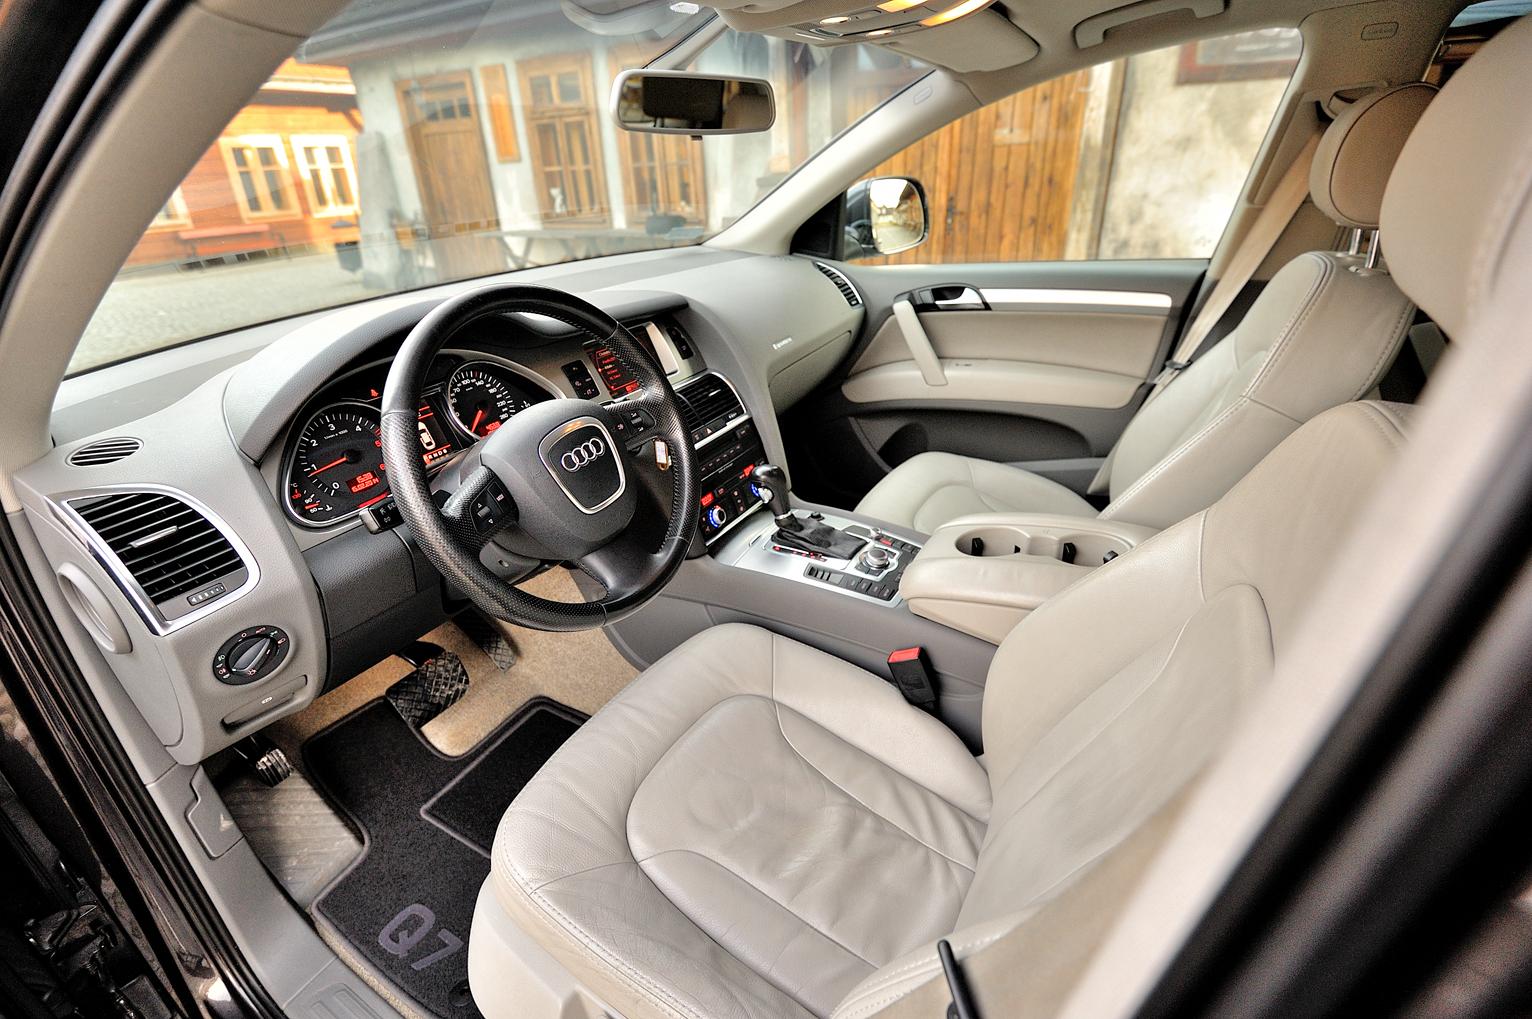 Datei:Audi Q7 interior.png – Wikipedia